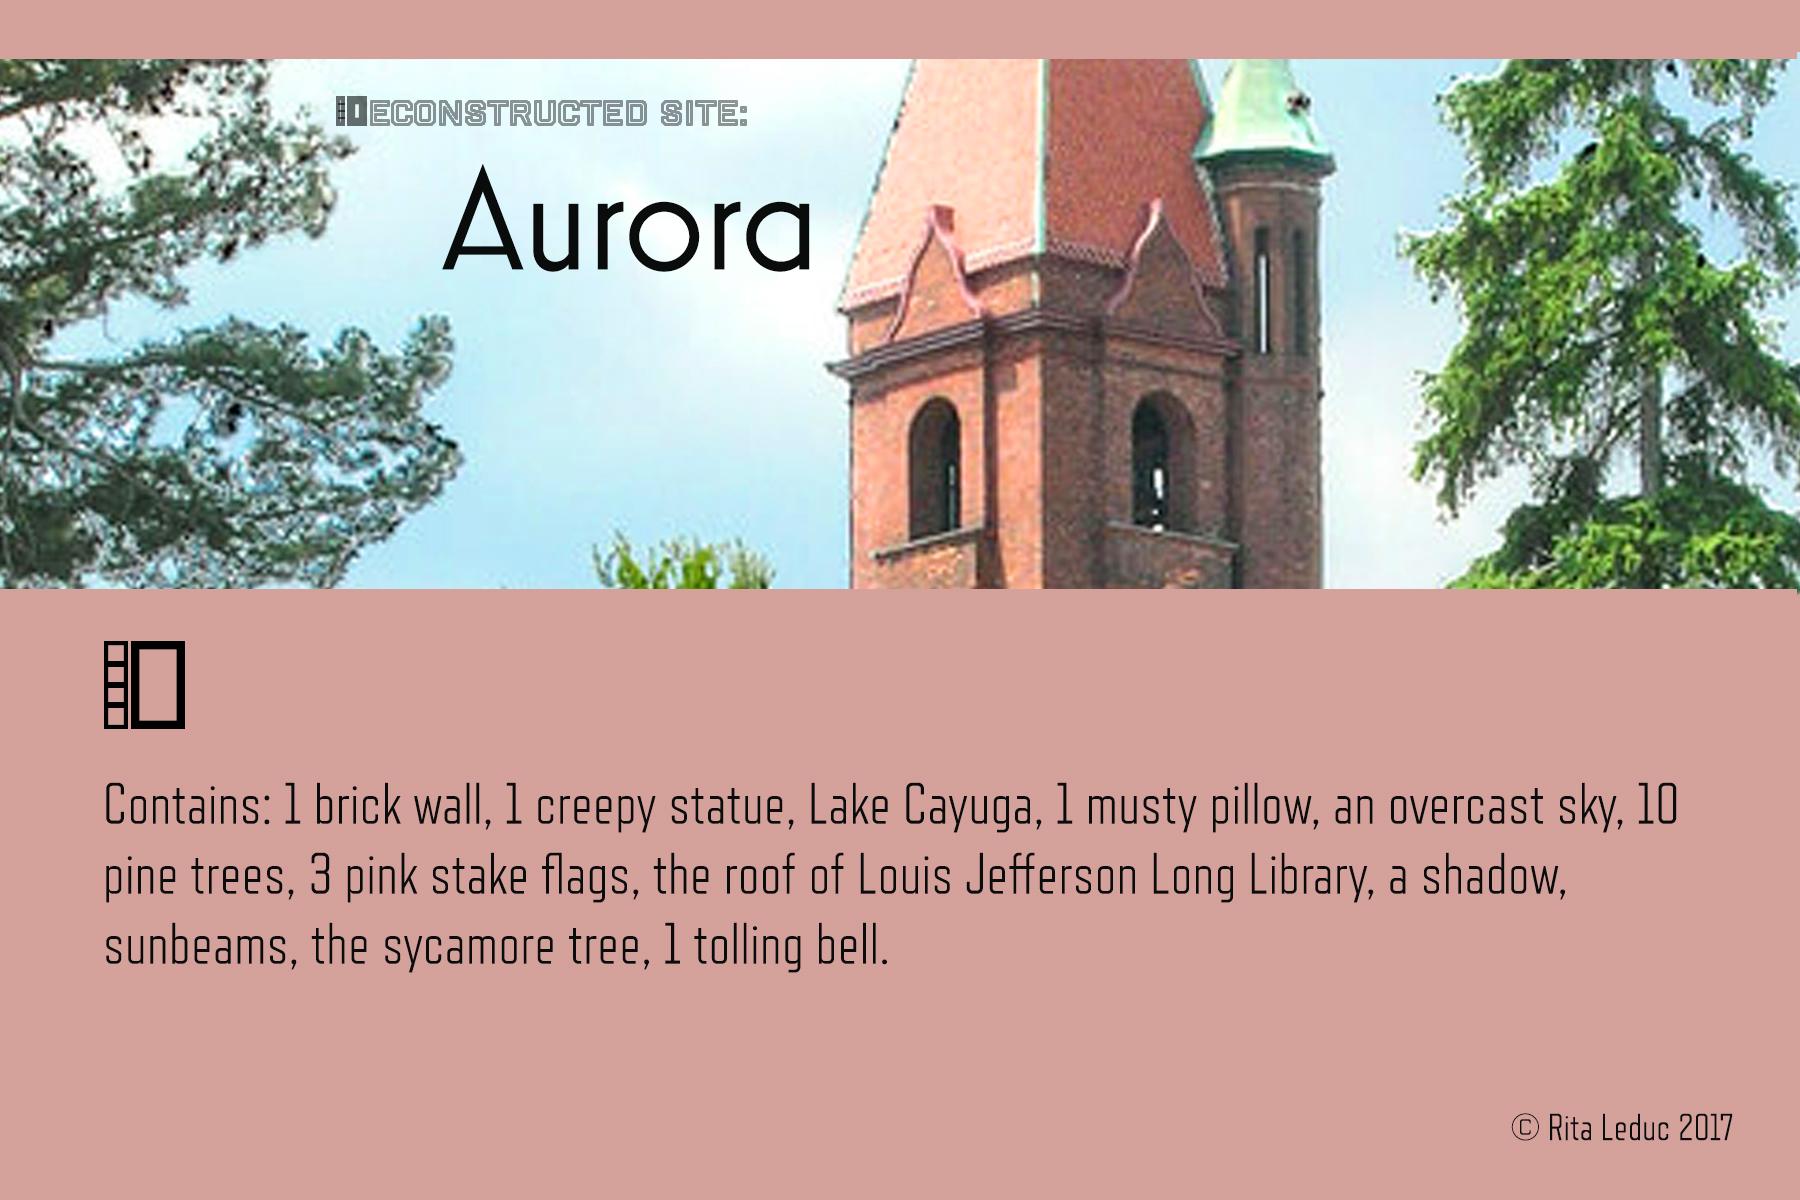 Aurora: Deconstructed Site